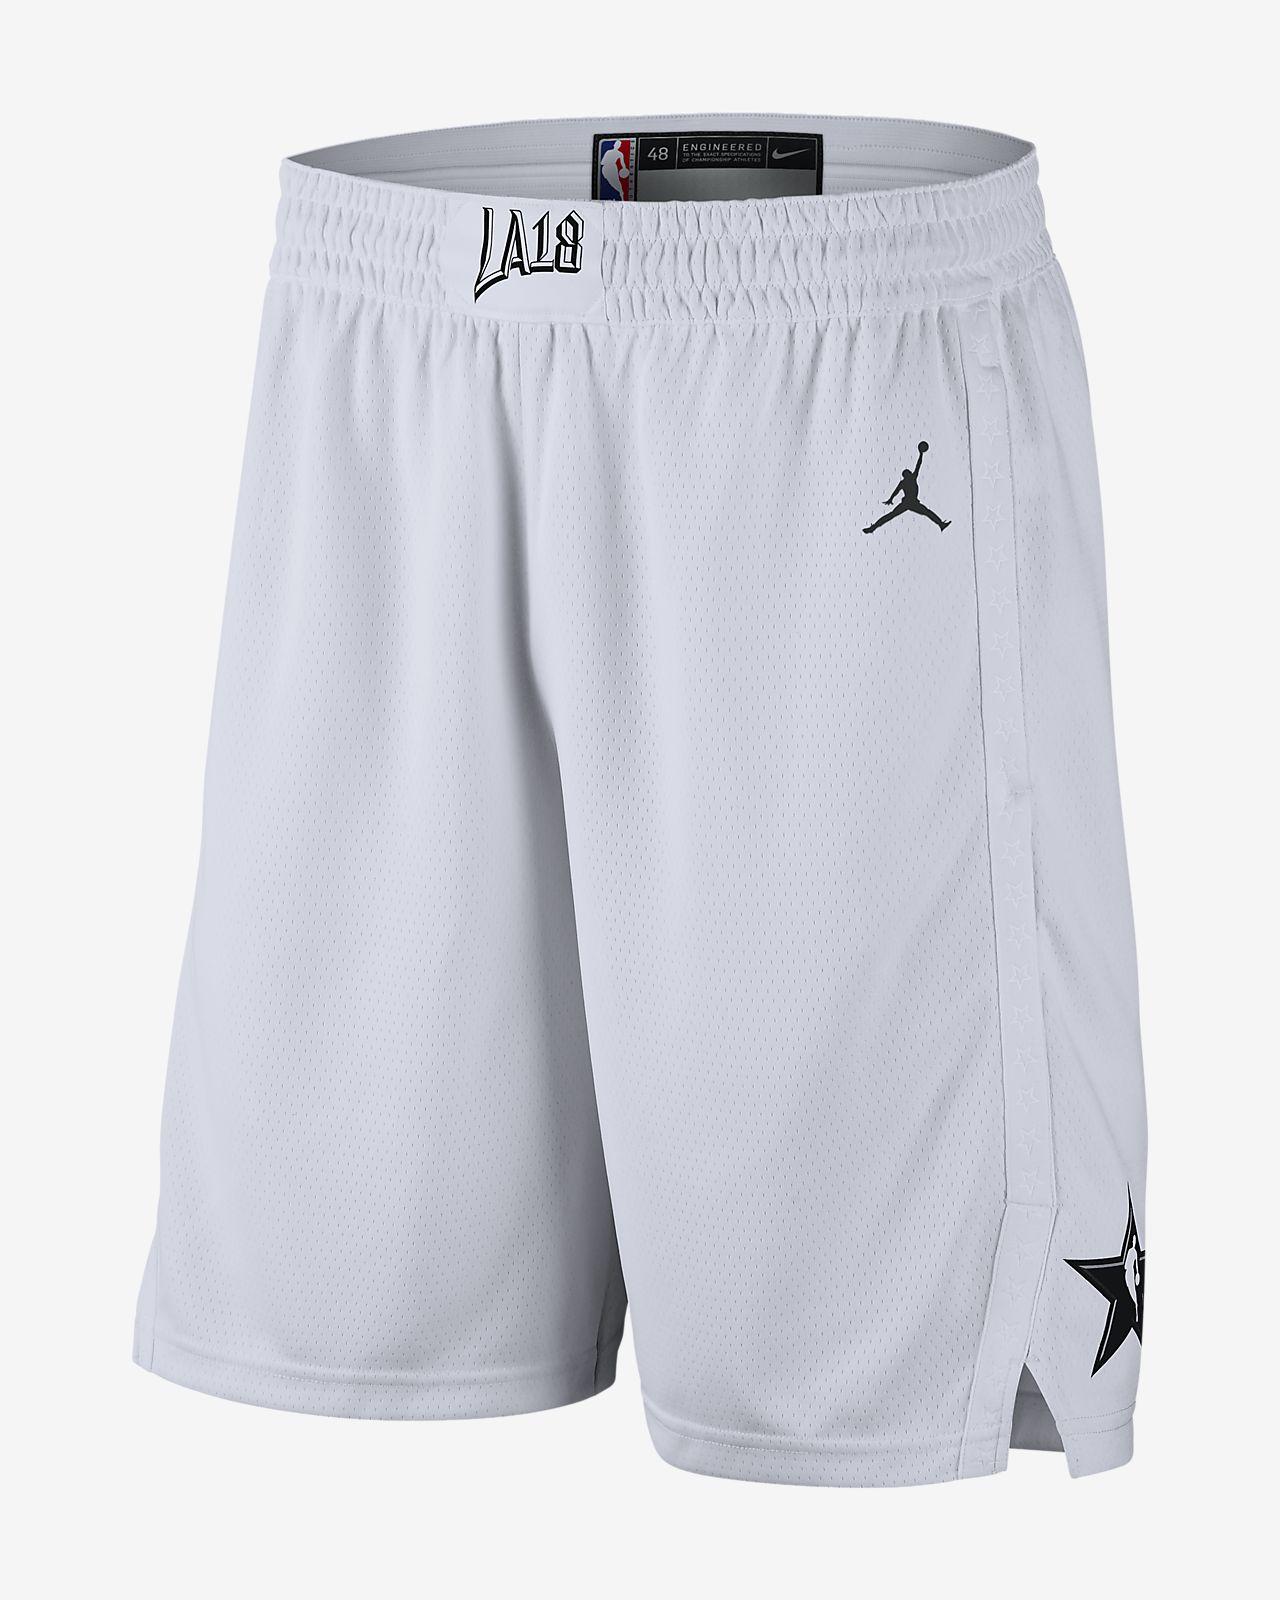 ... Jordan AS Icon Edition Swingman Men's NBA Shorts